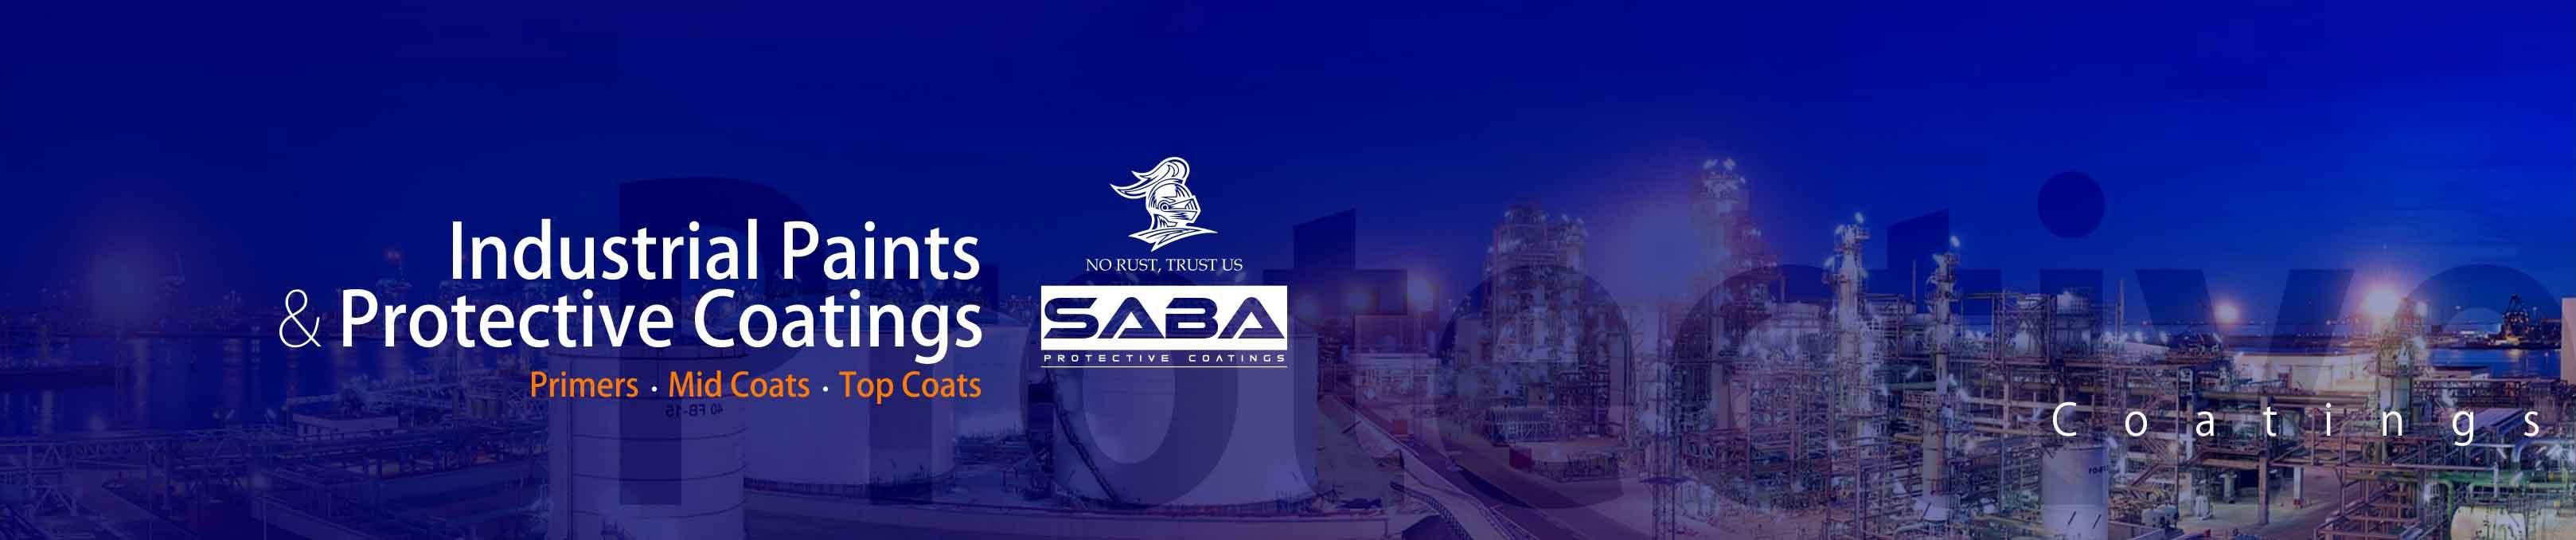 Saba-Slim-Slider-2-English web